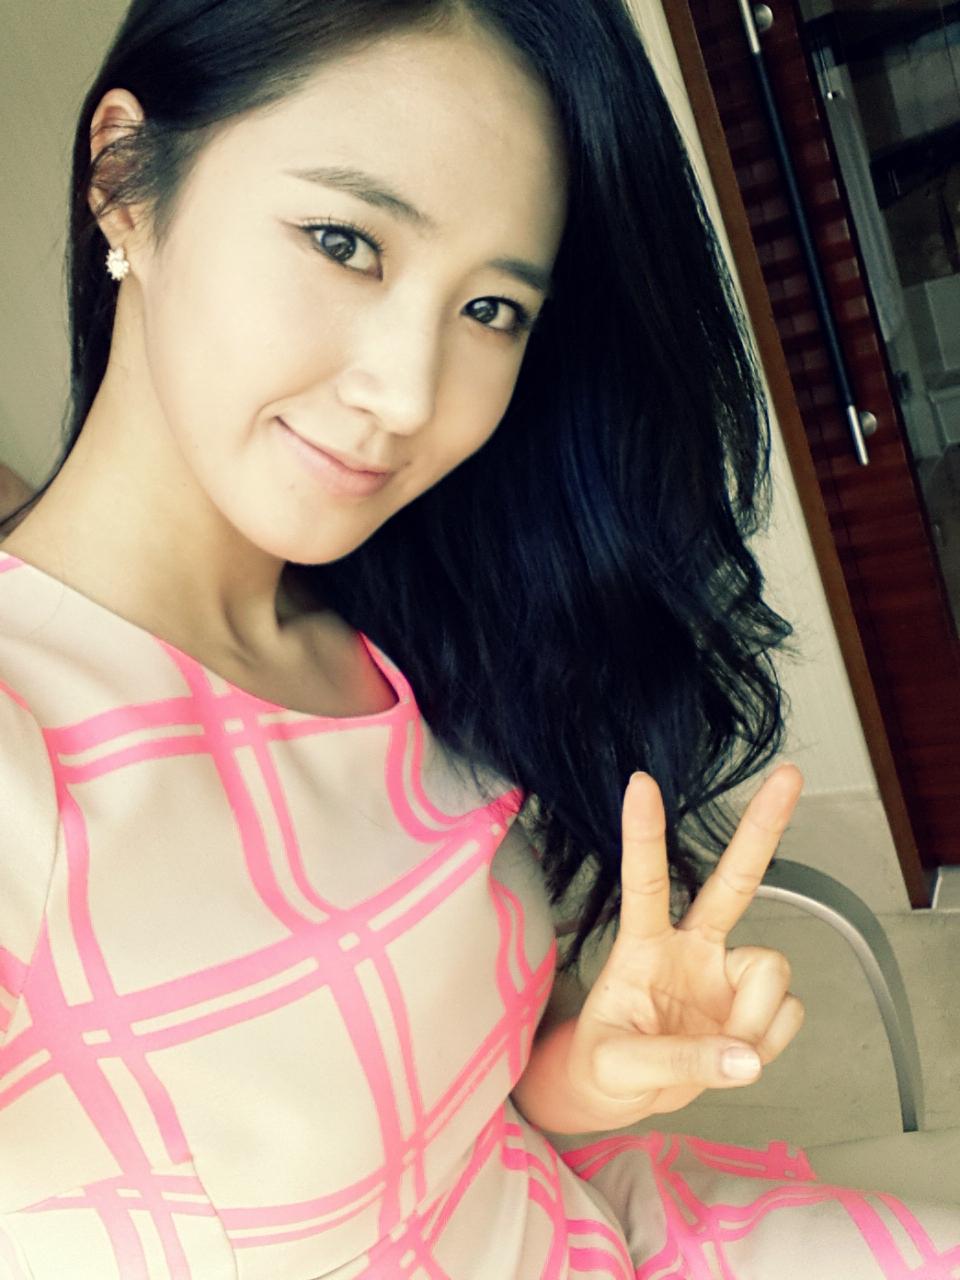 Snsd yuri dating 2014 6